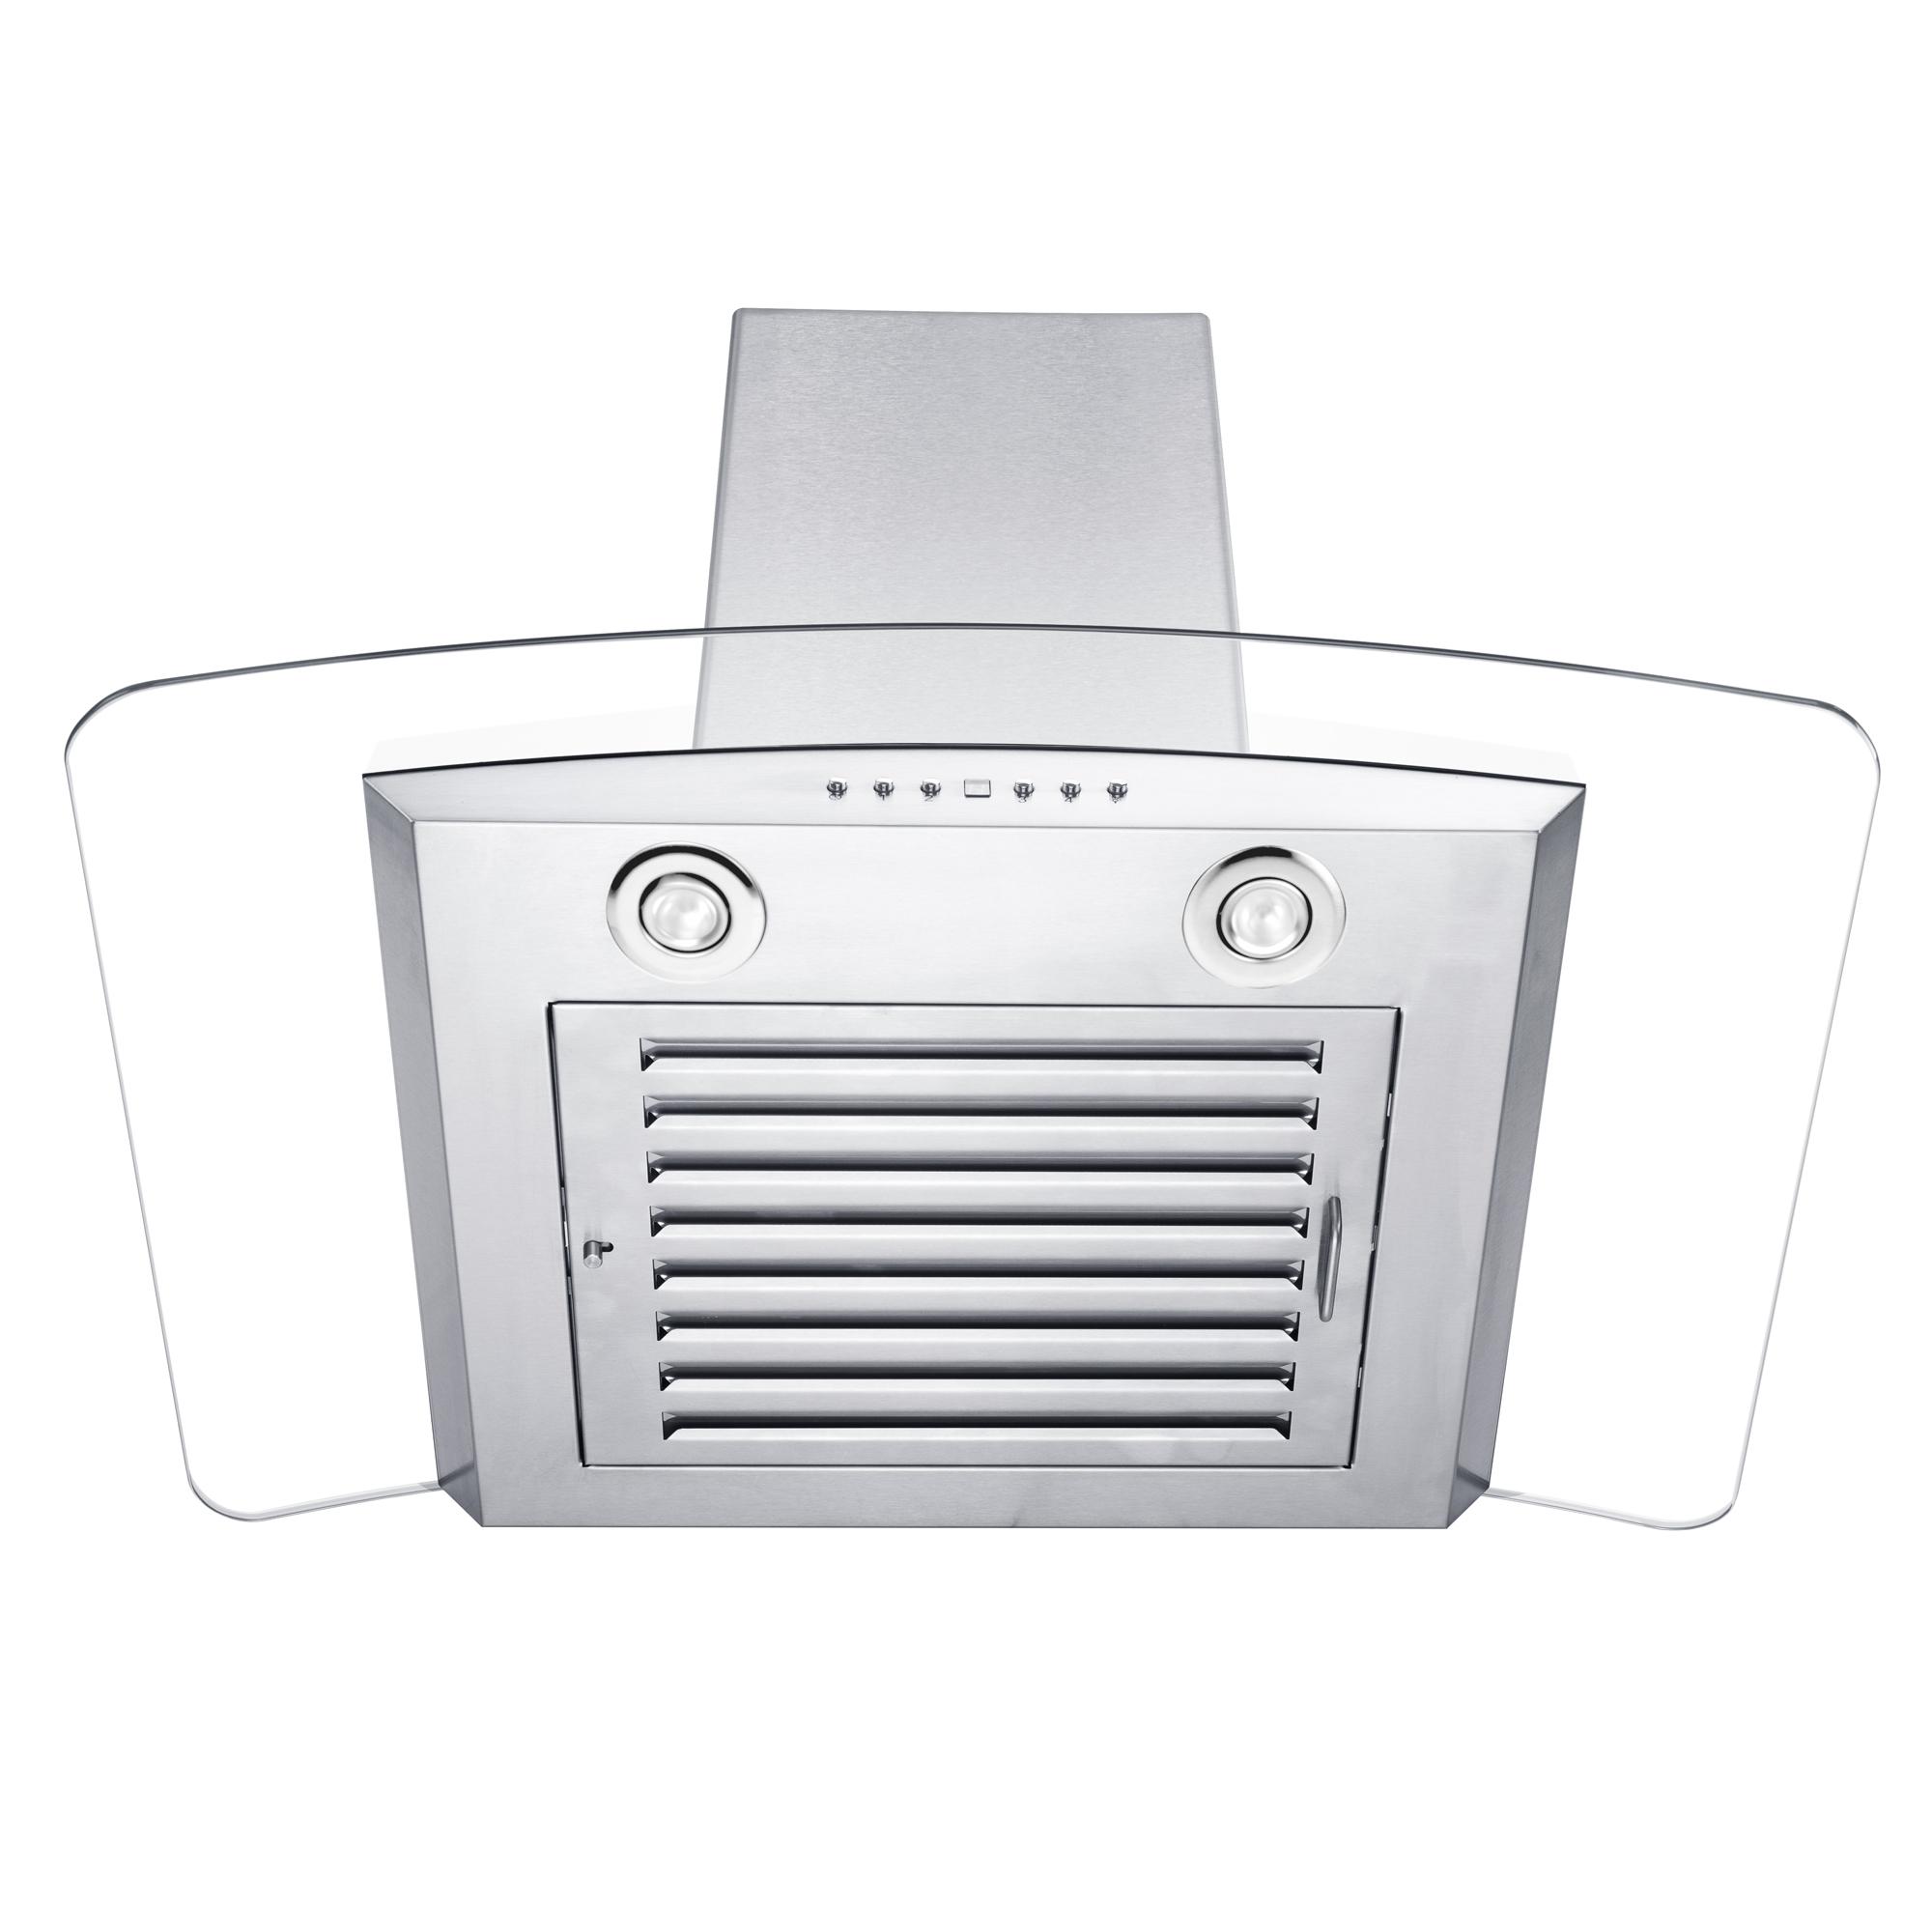 zline-stainless-steel-wall-mounted-range-hood-KZ-new-bottom.jpg